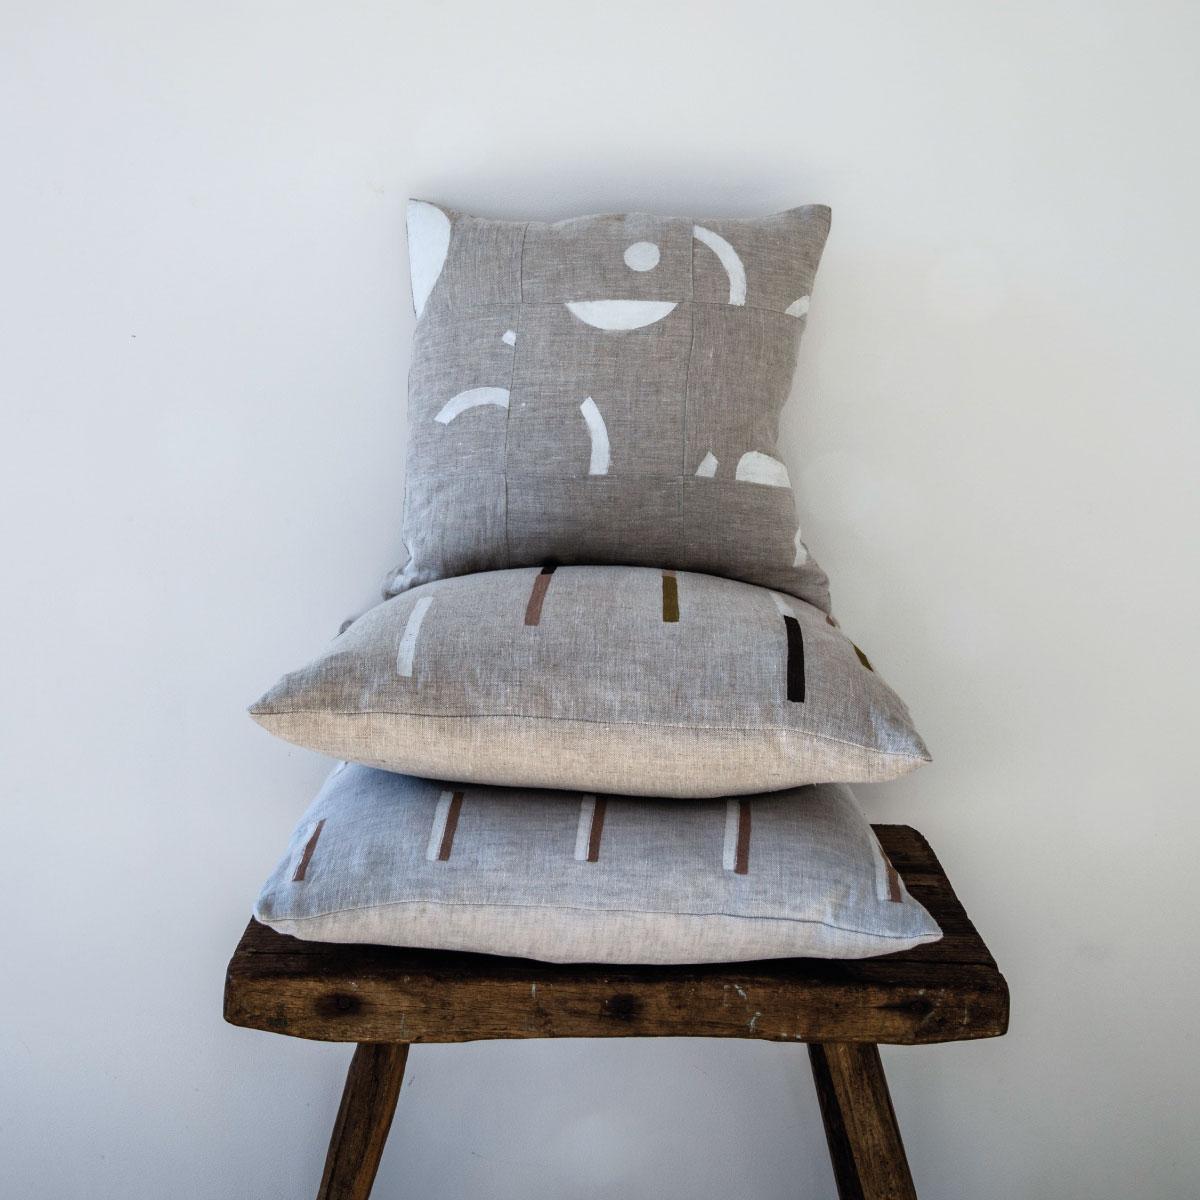 Ren-London-Collage-Cushion-White